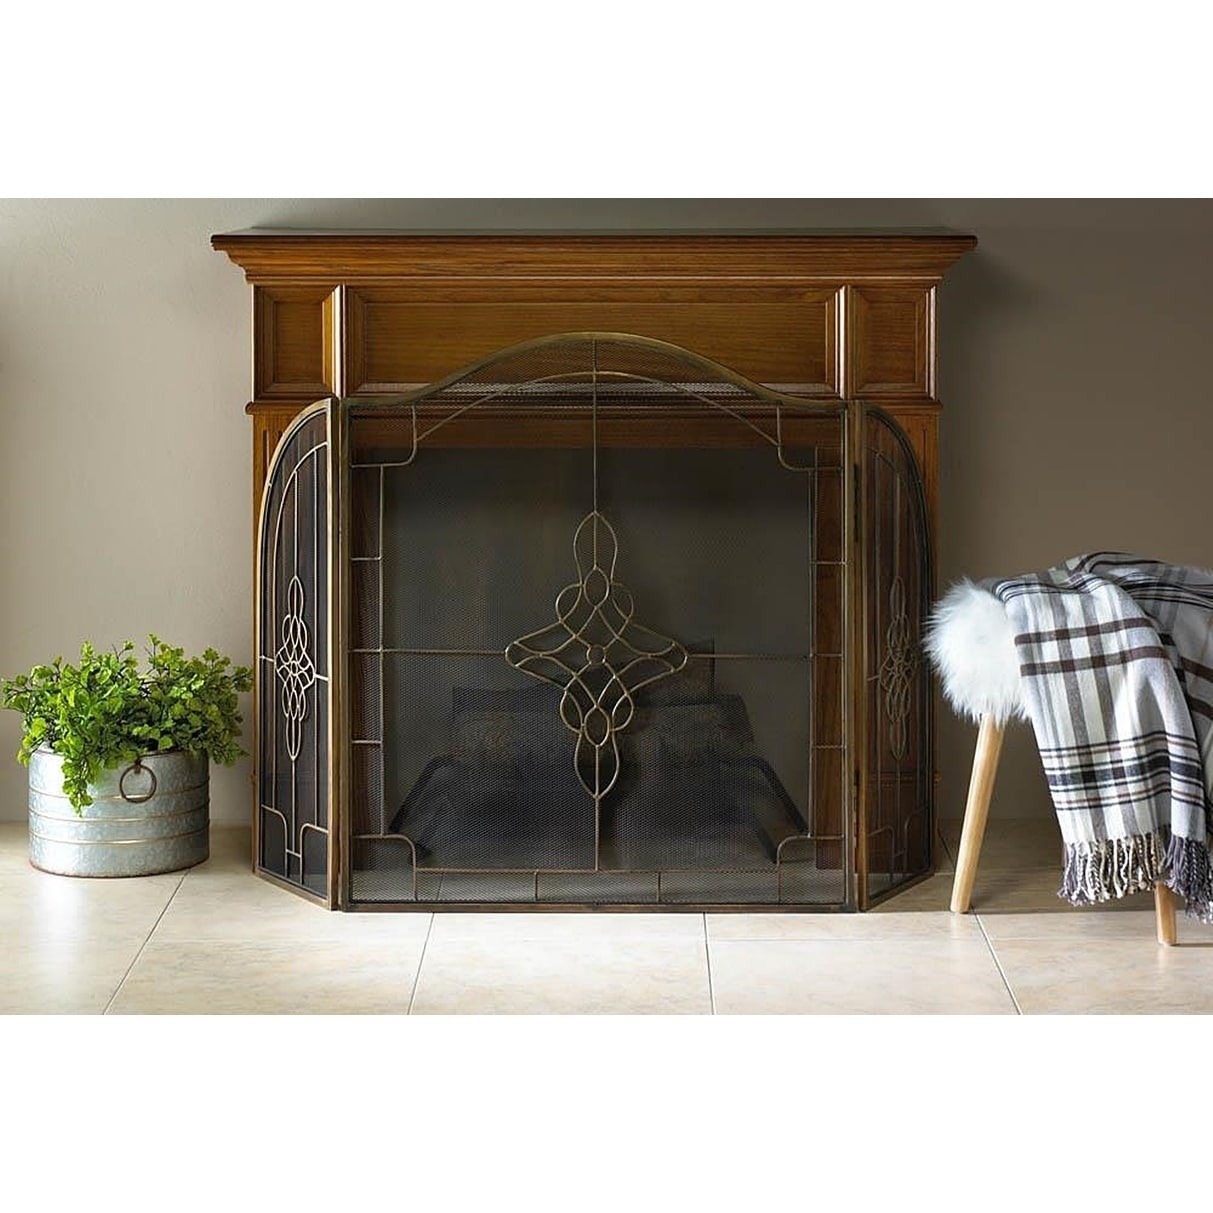 BSD National Supplies Livingston Elegant Fireplace Screen